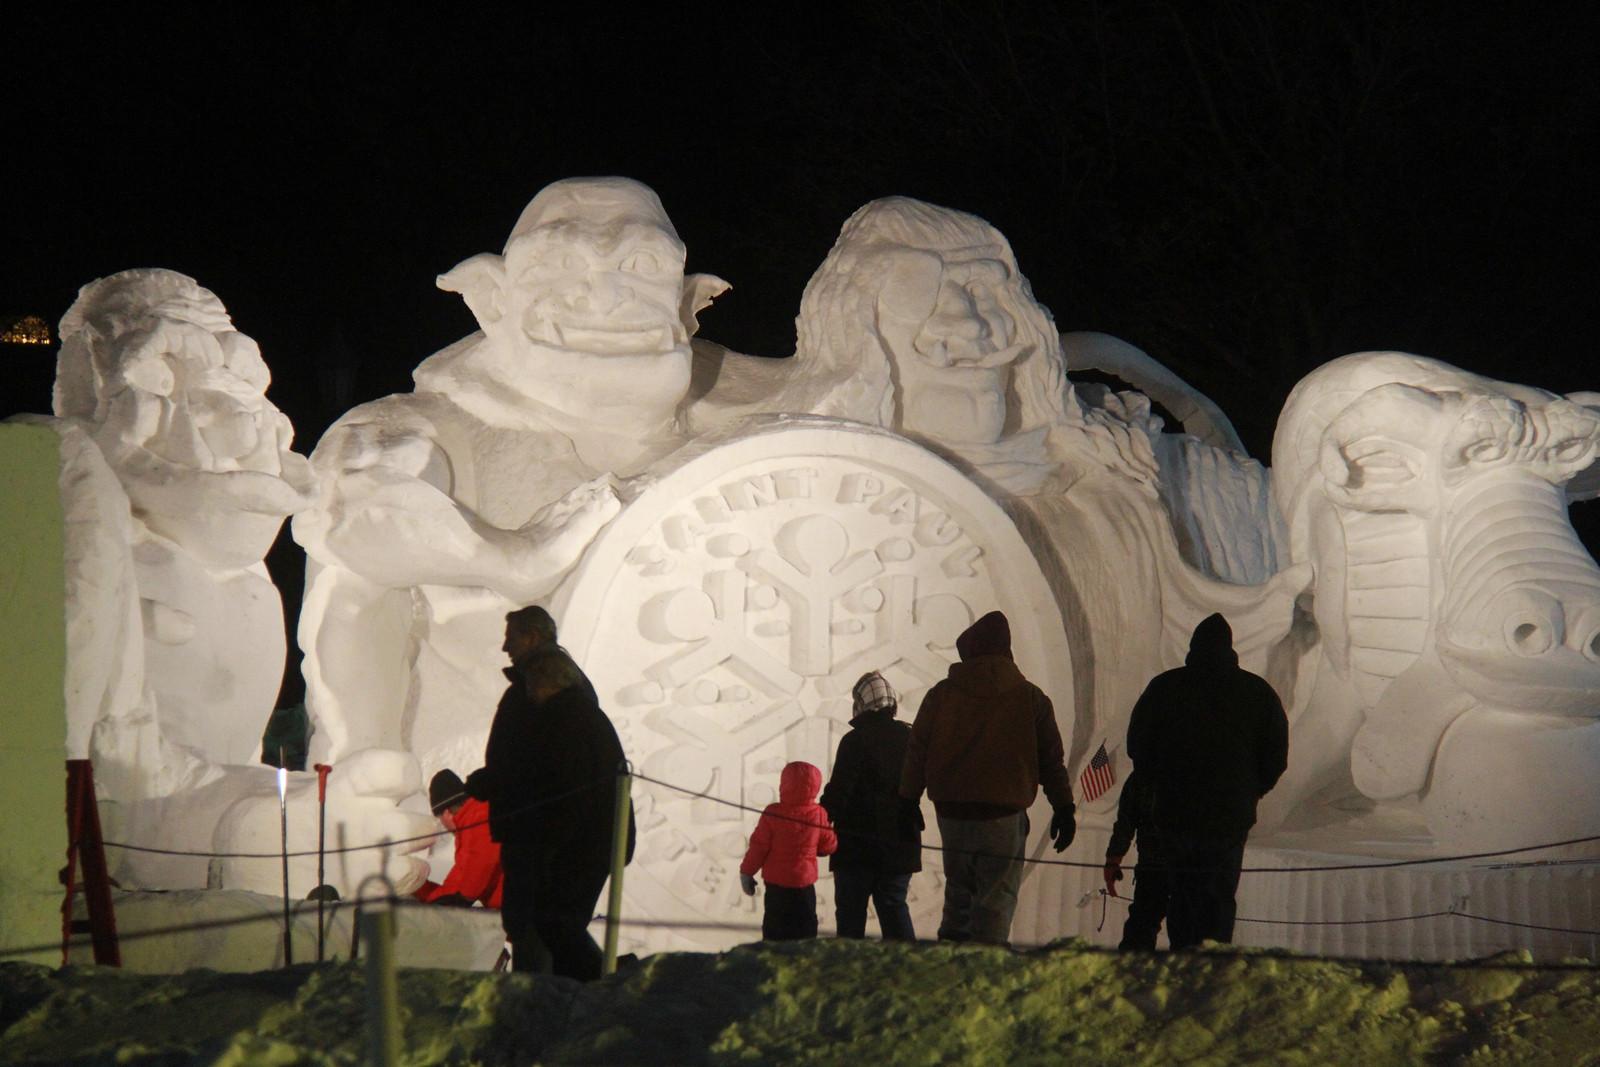 Snow Park - Snow Image with people